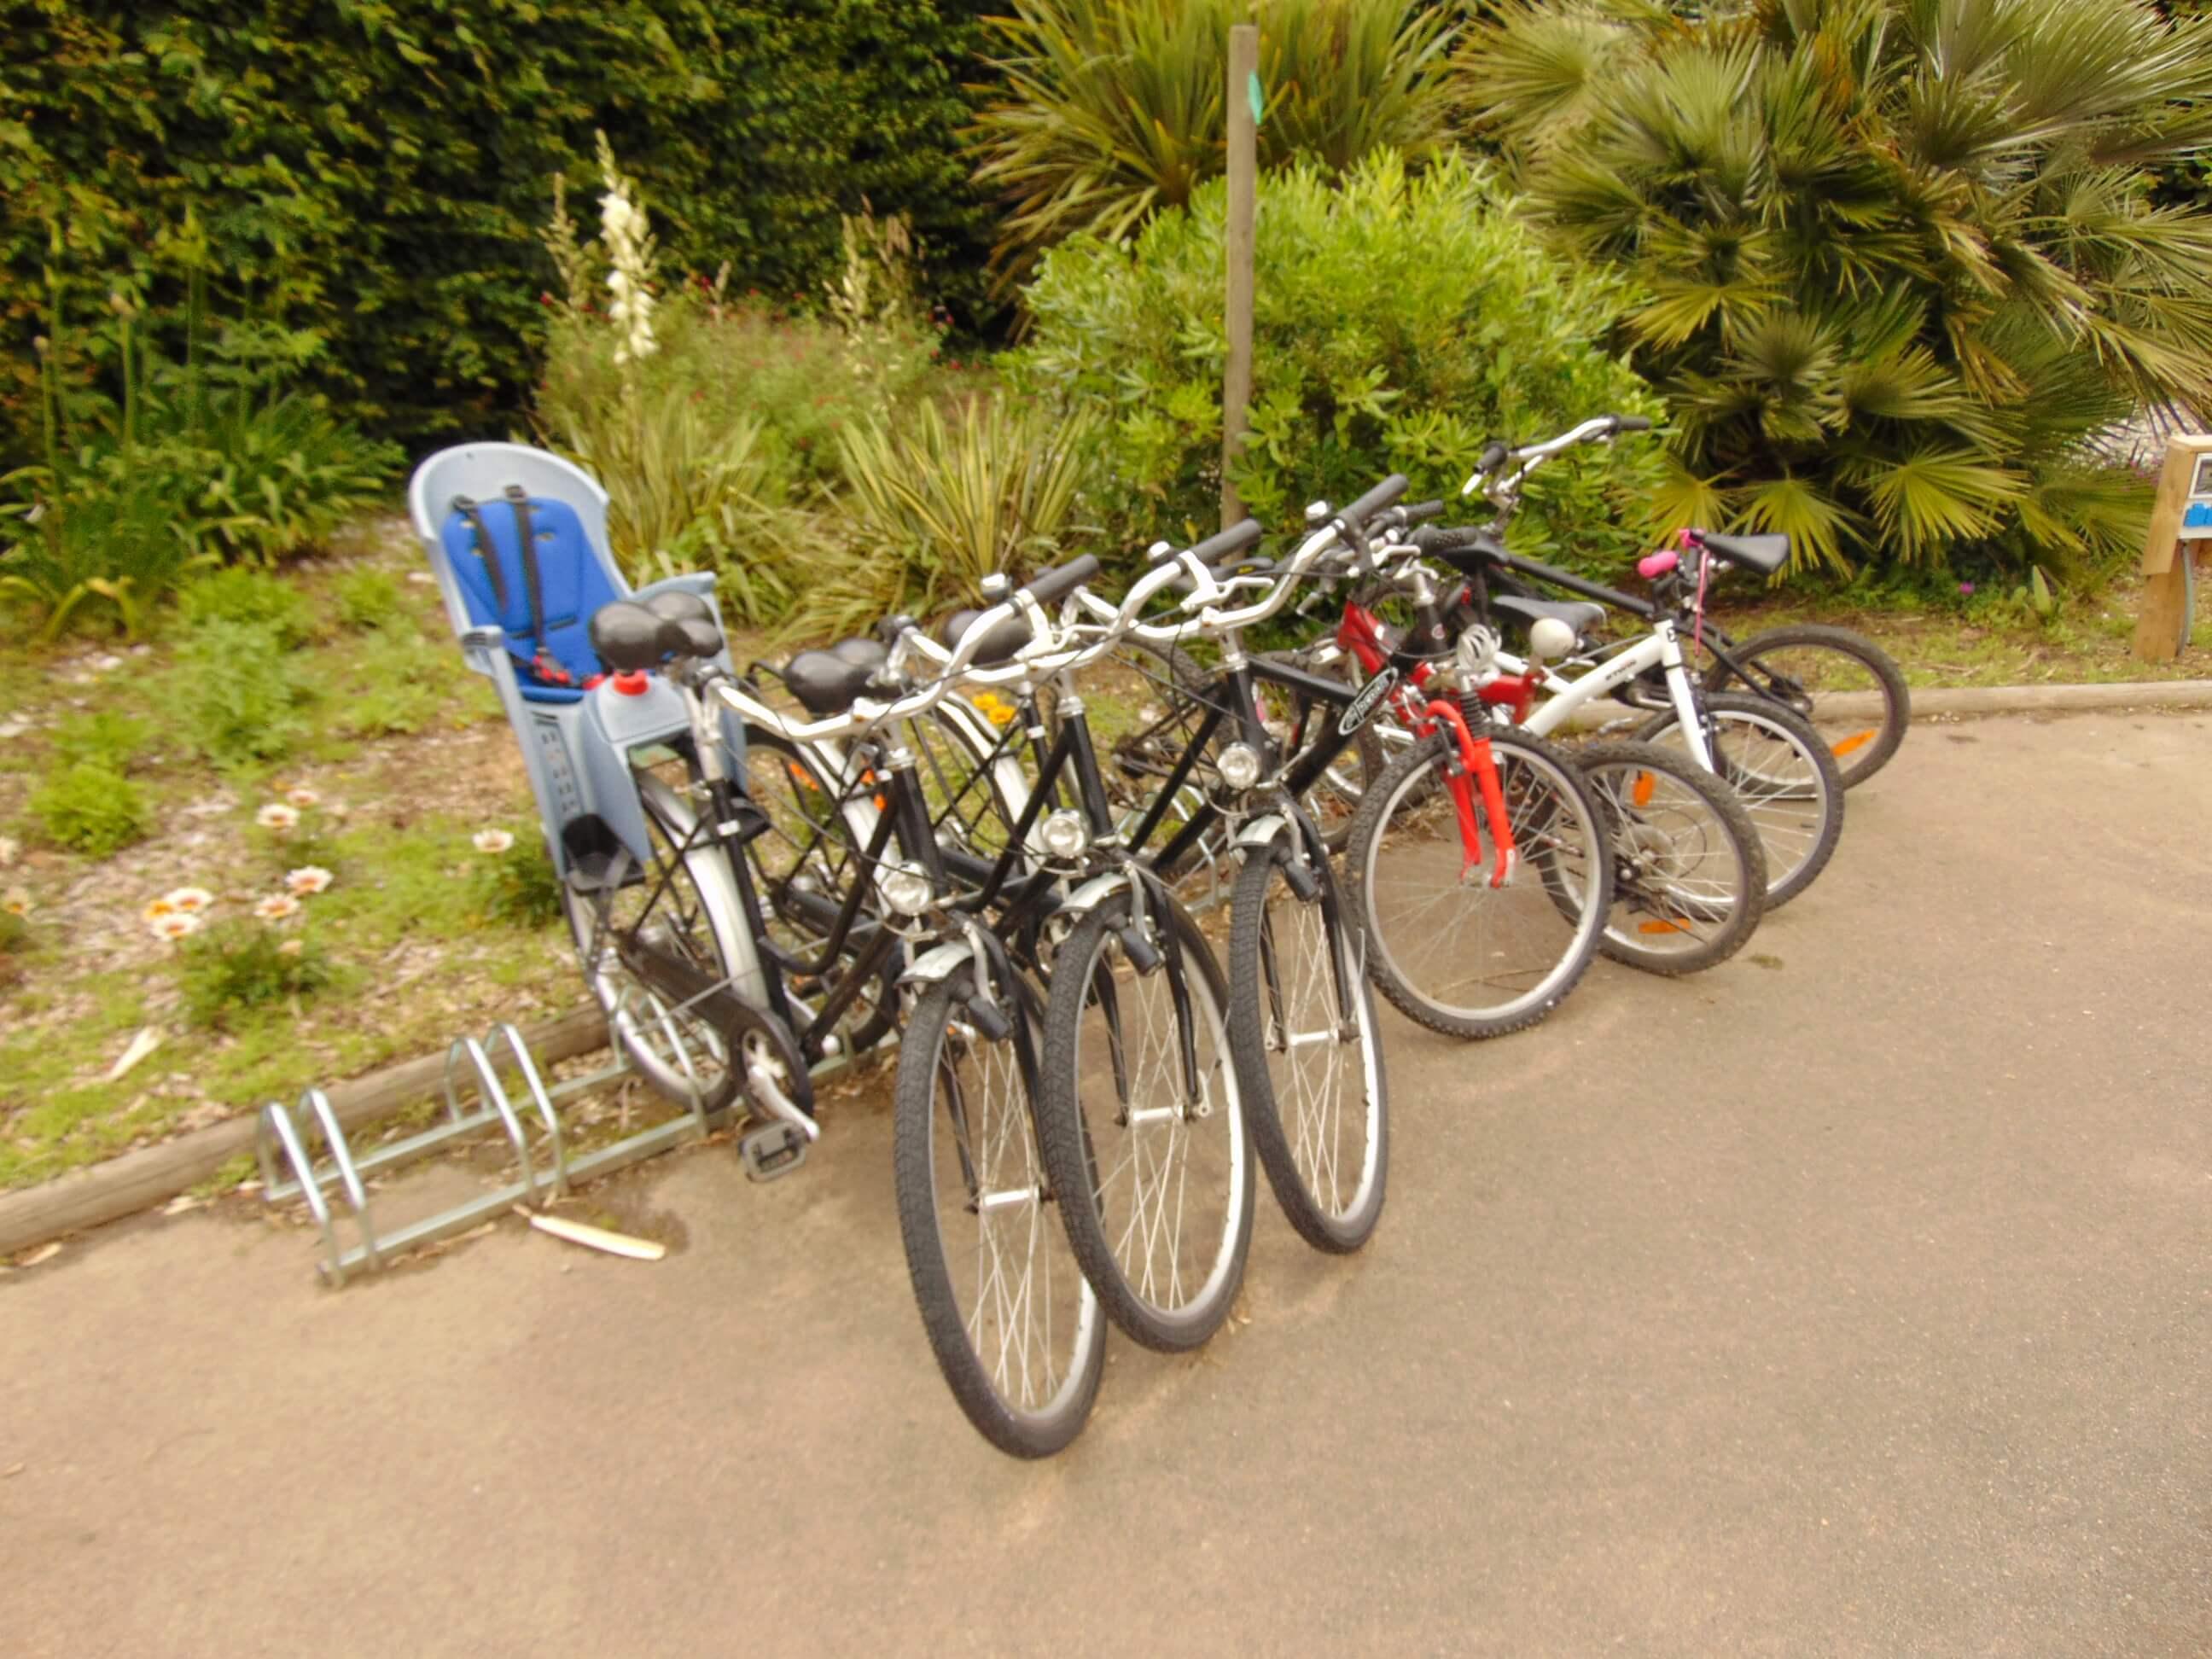 location de vélo au camping